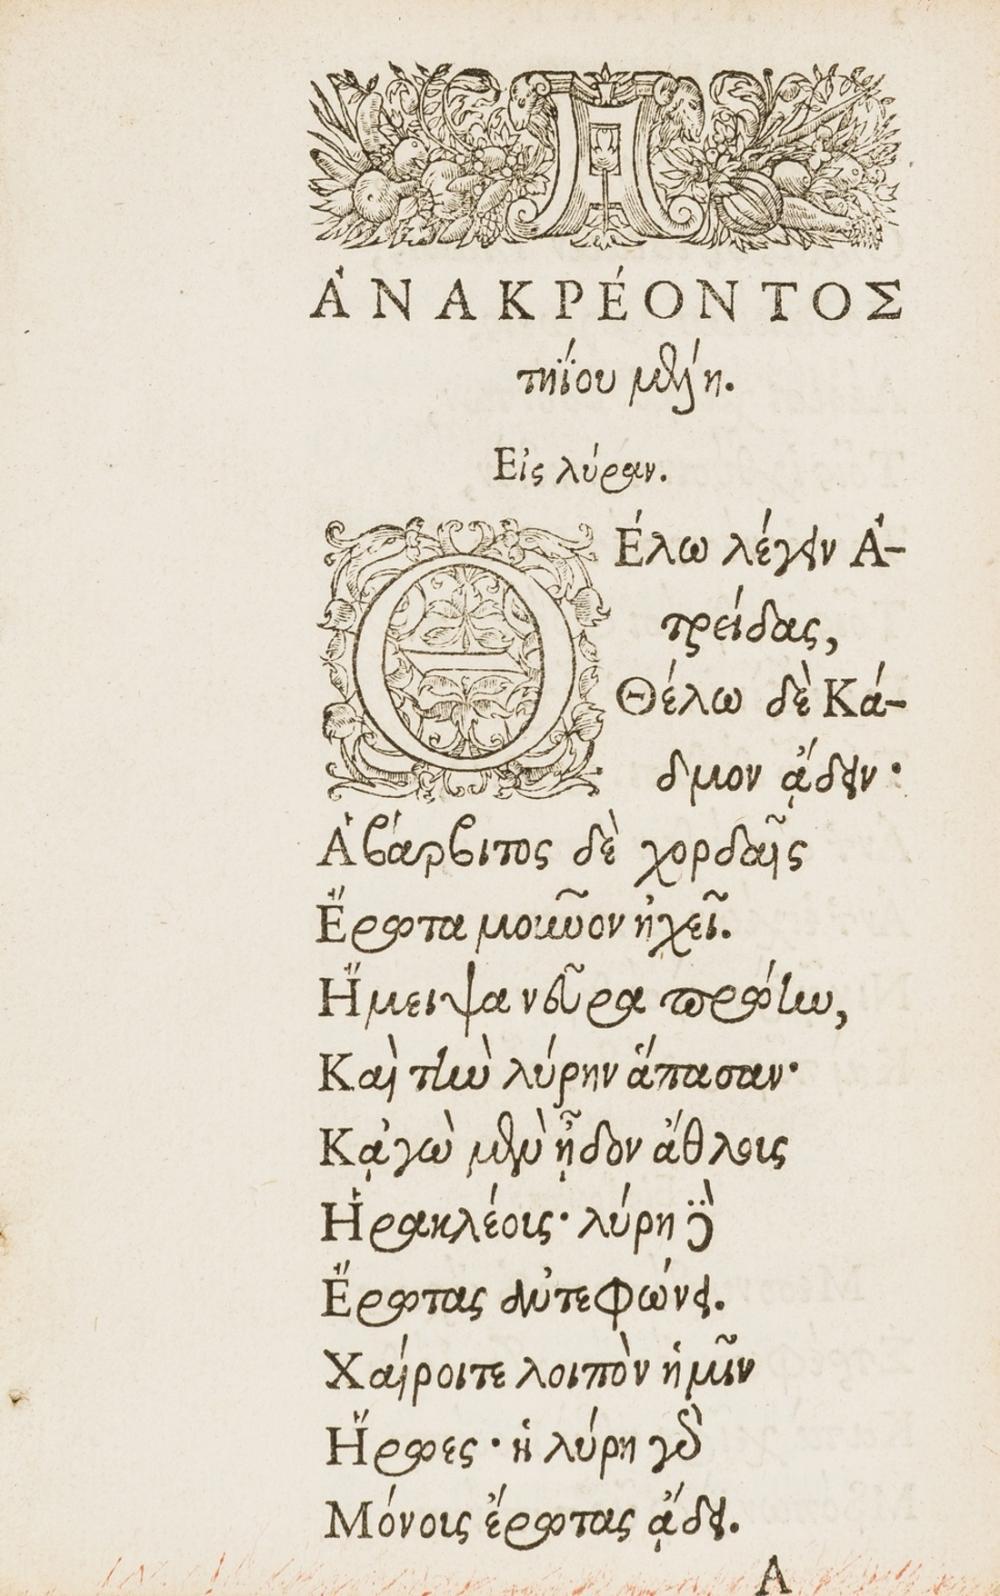 Estienne.- Anacreon. [Odes], editio princeps and the first work printed by Henri Estienne, Paris, Henri Estienne, 1554.